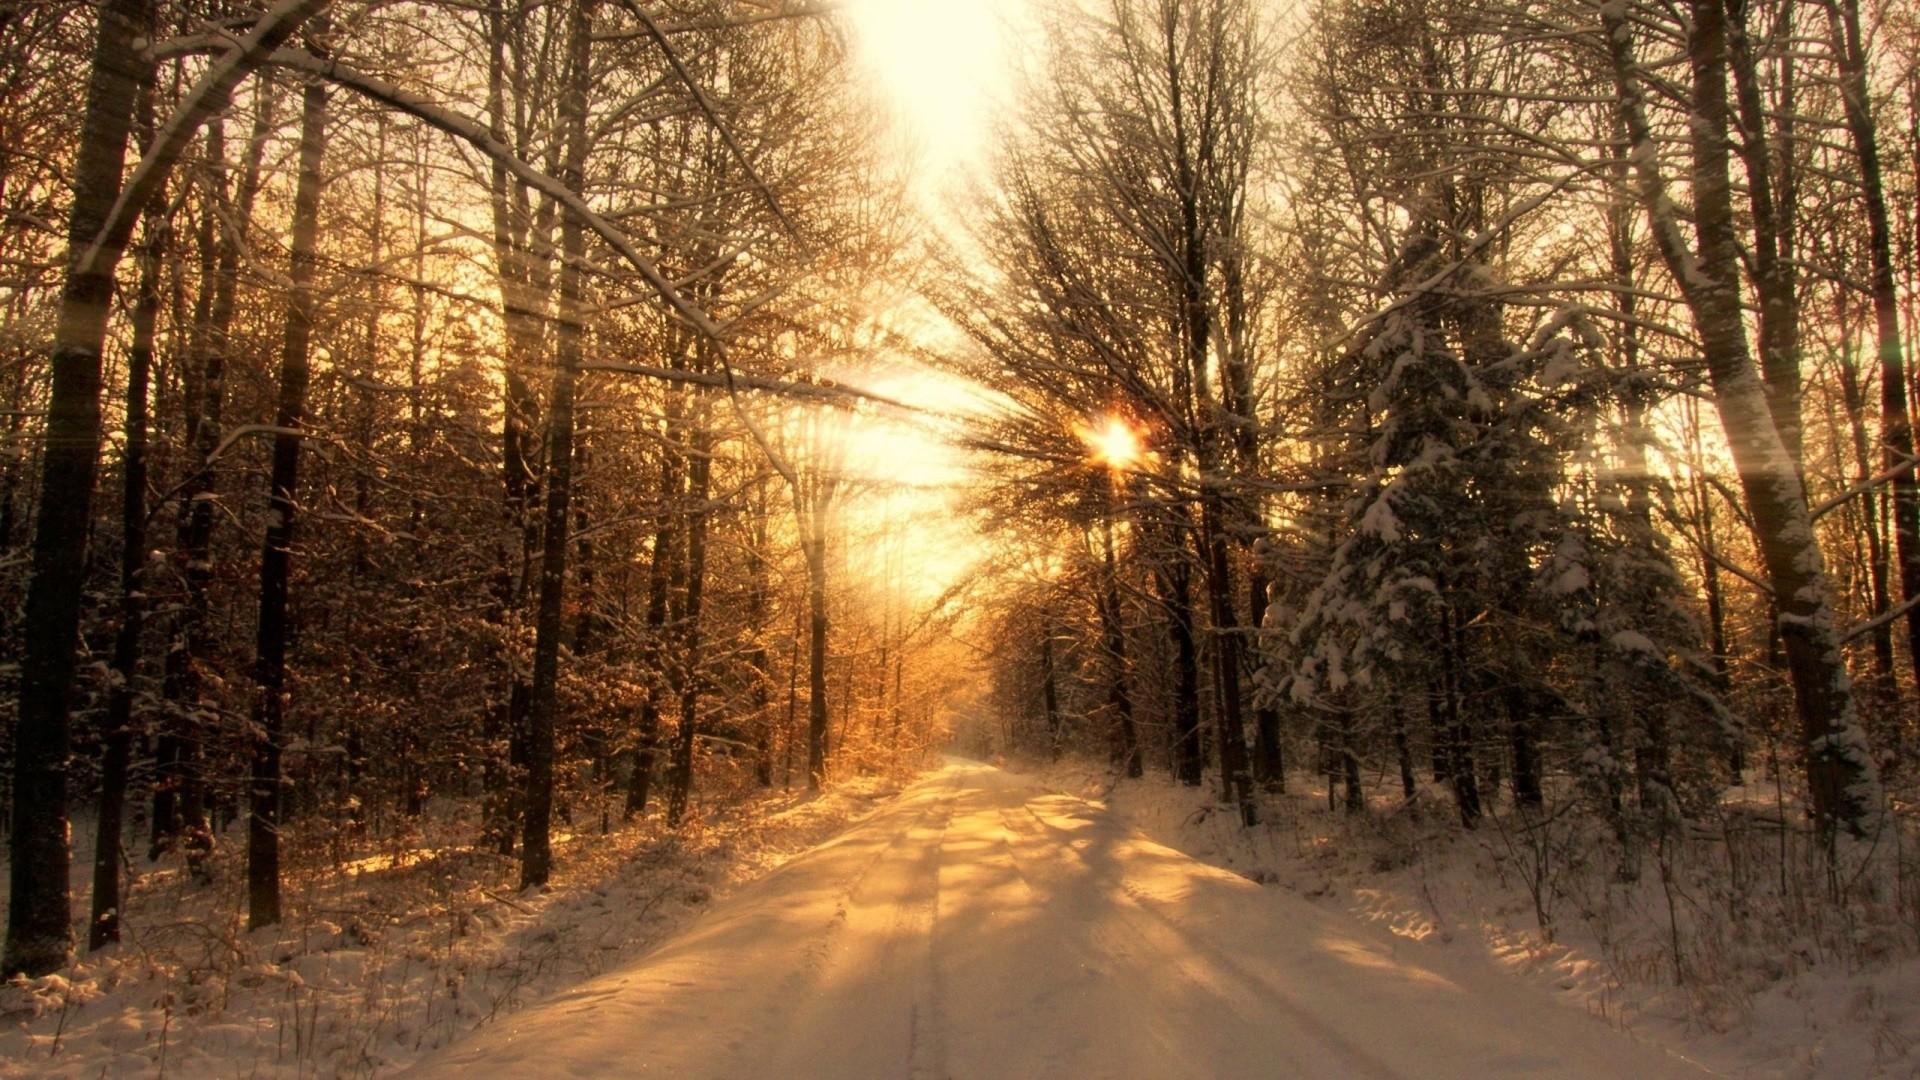 Winter Forest Road & Sun Light